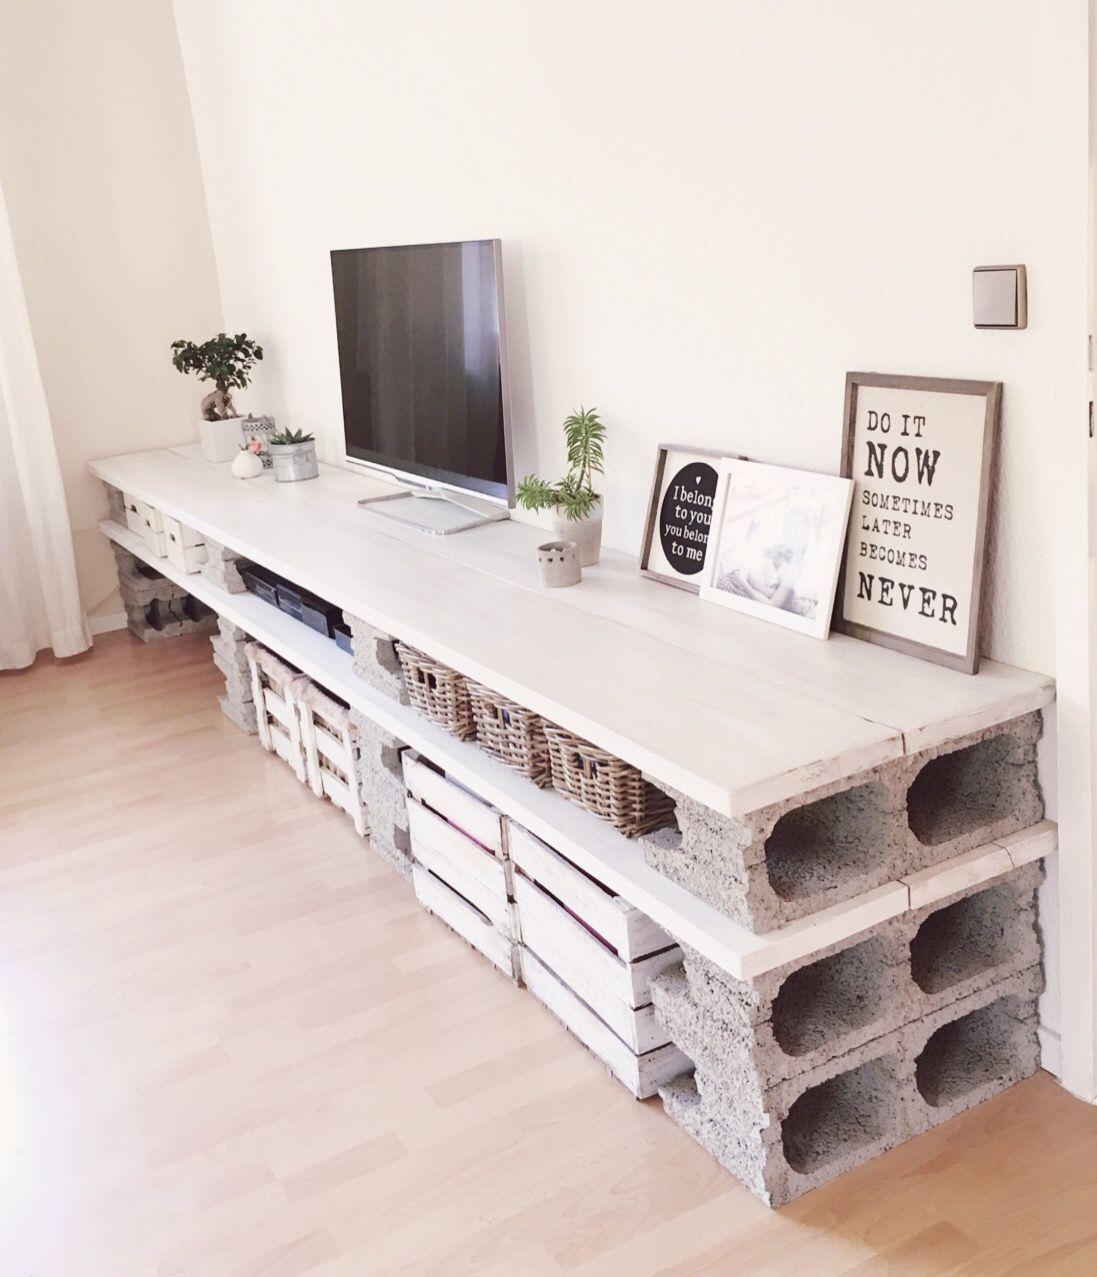 fast fertig | tv lowboard, lowboard und inspiration, Schlafzimmer entwurf